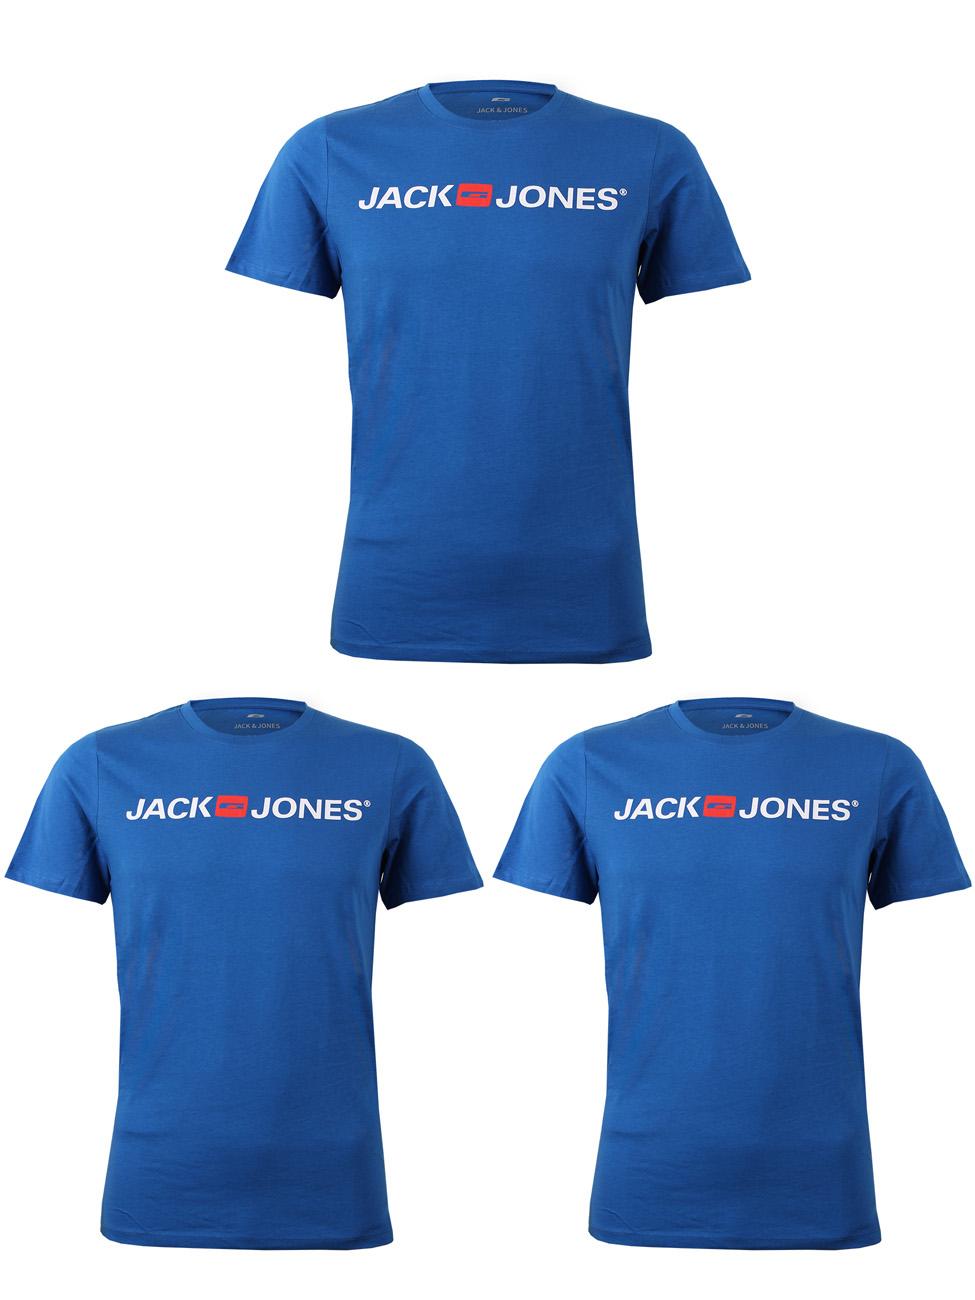 jack-jones-herren-t-shirt-jjeprolog-tee-ss-crew-neck-im-3er-pack-in-vielen-farben